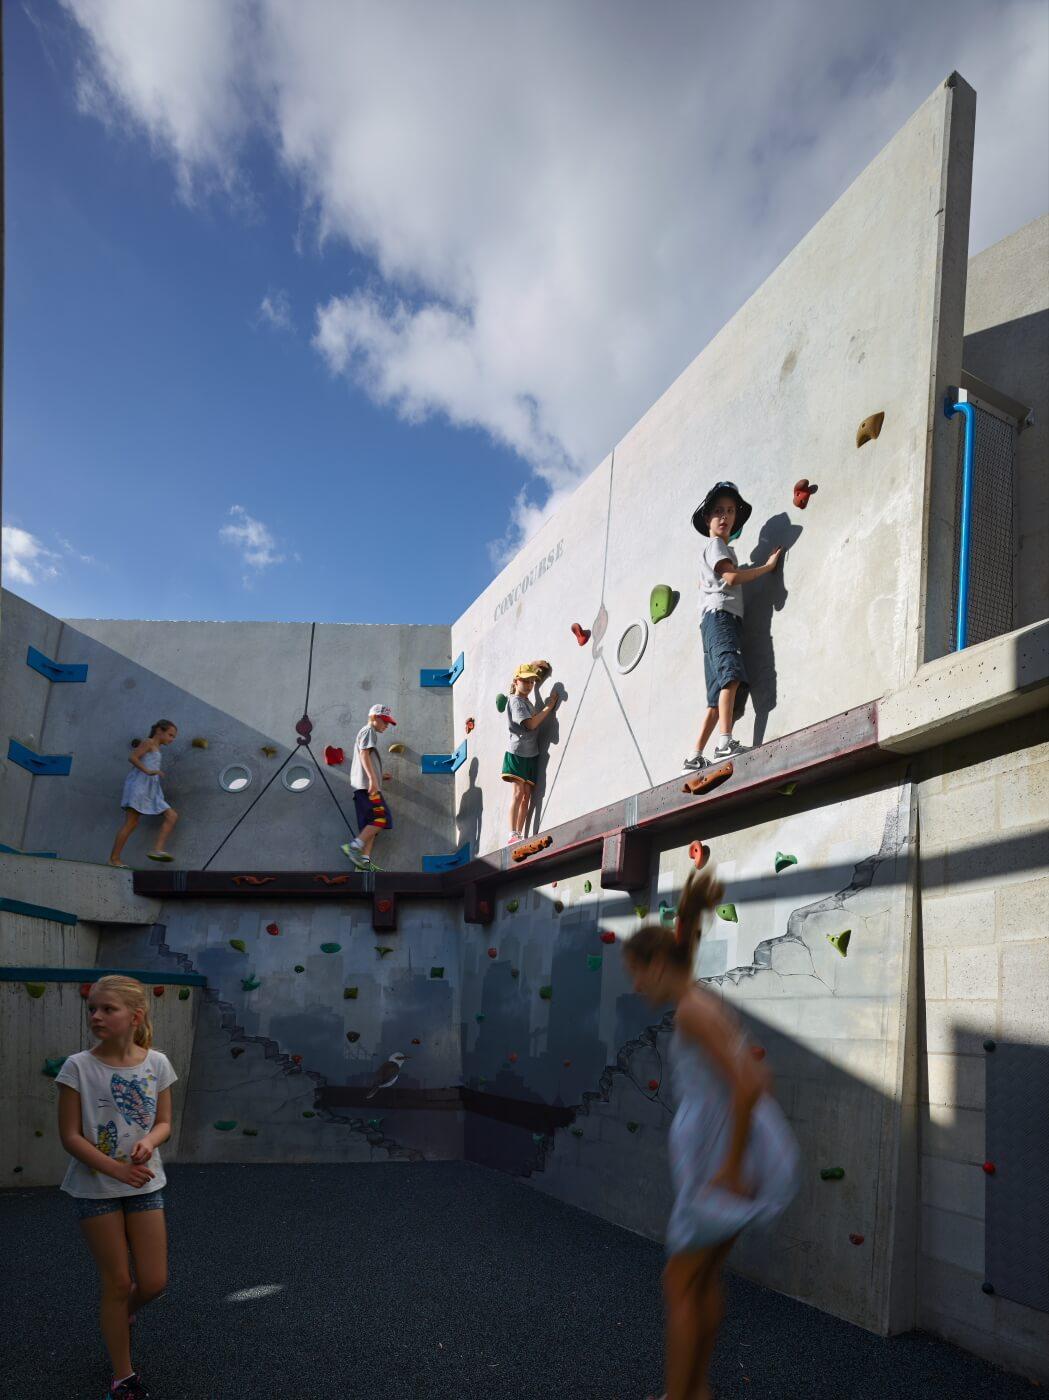 Frew-park-arena-playground-guymer-bailey-11.JPG